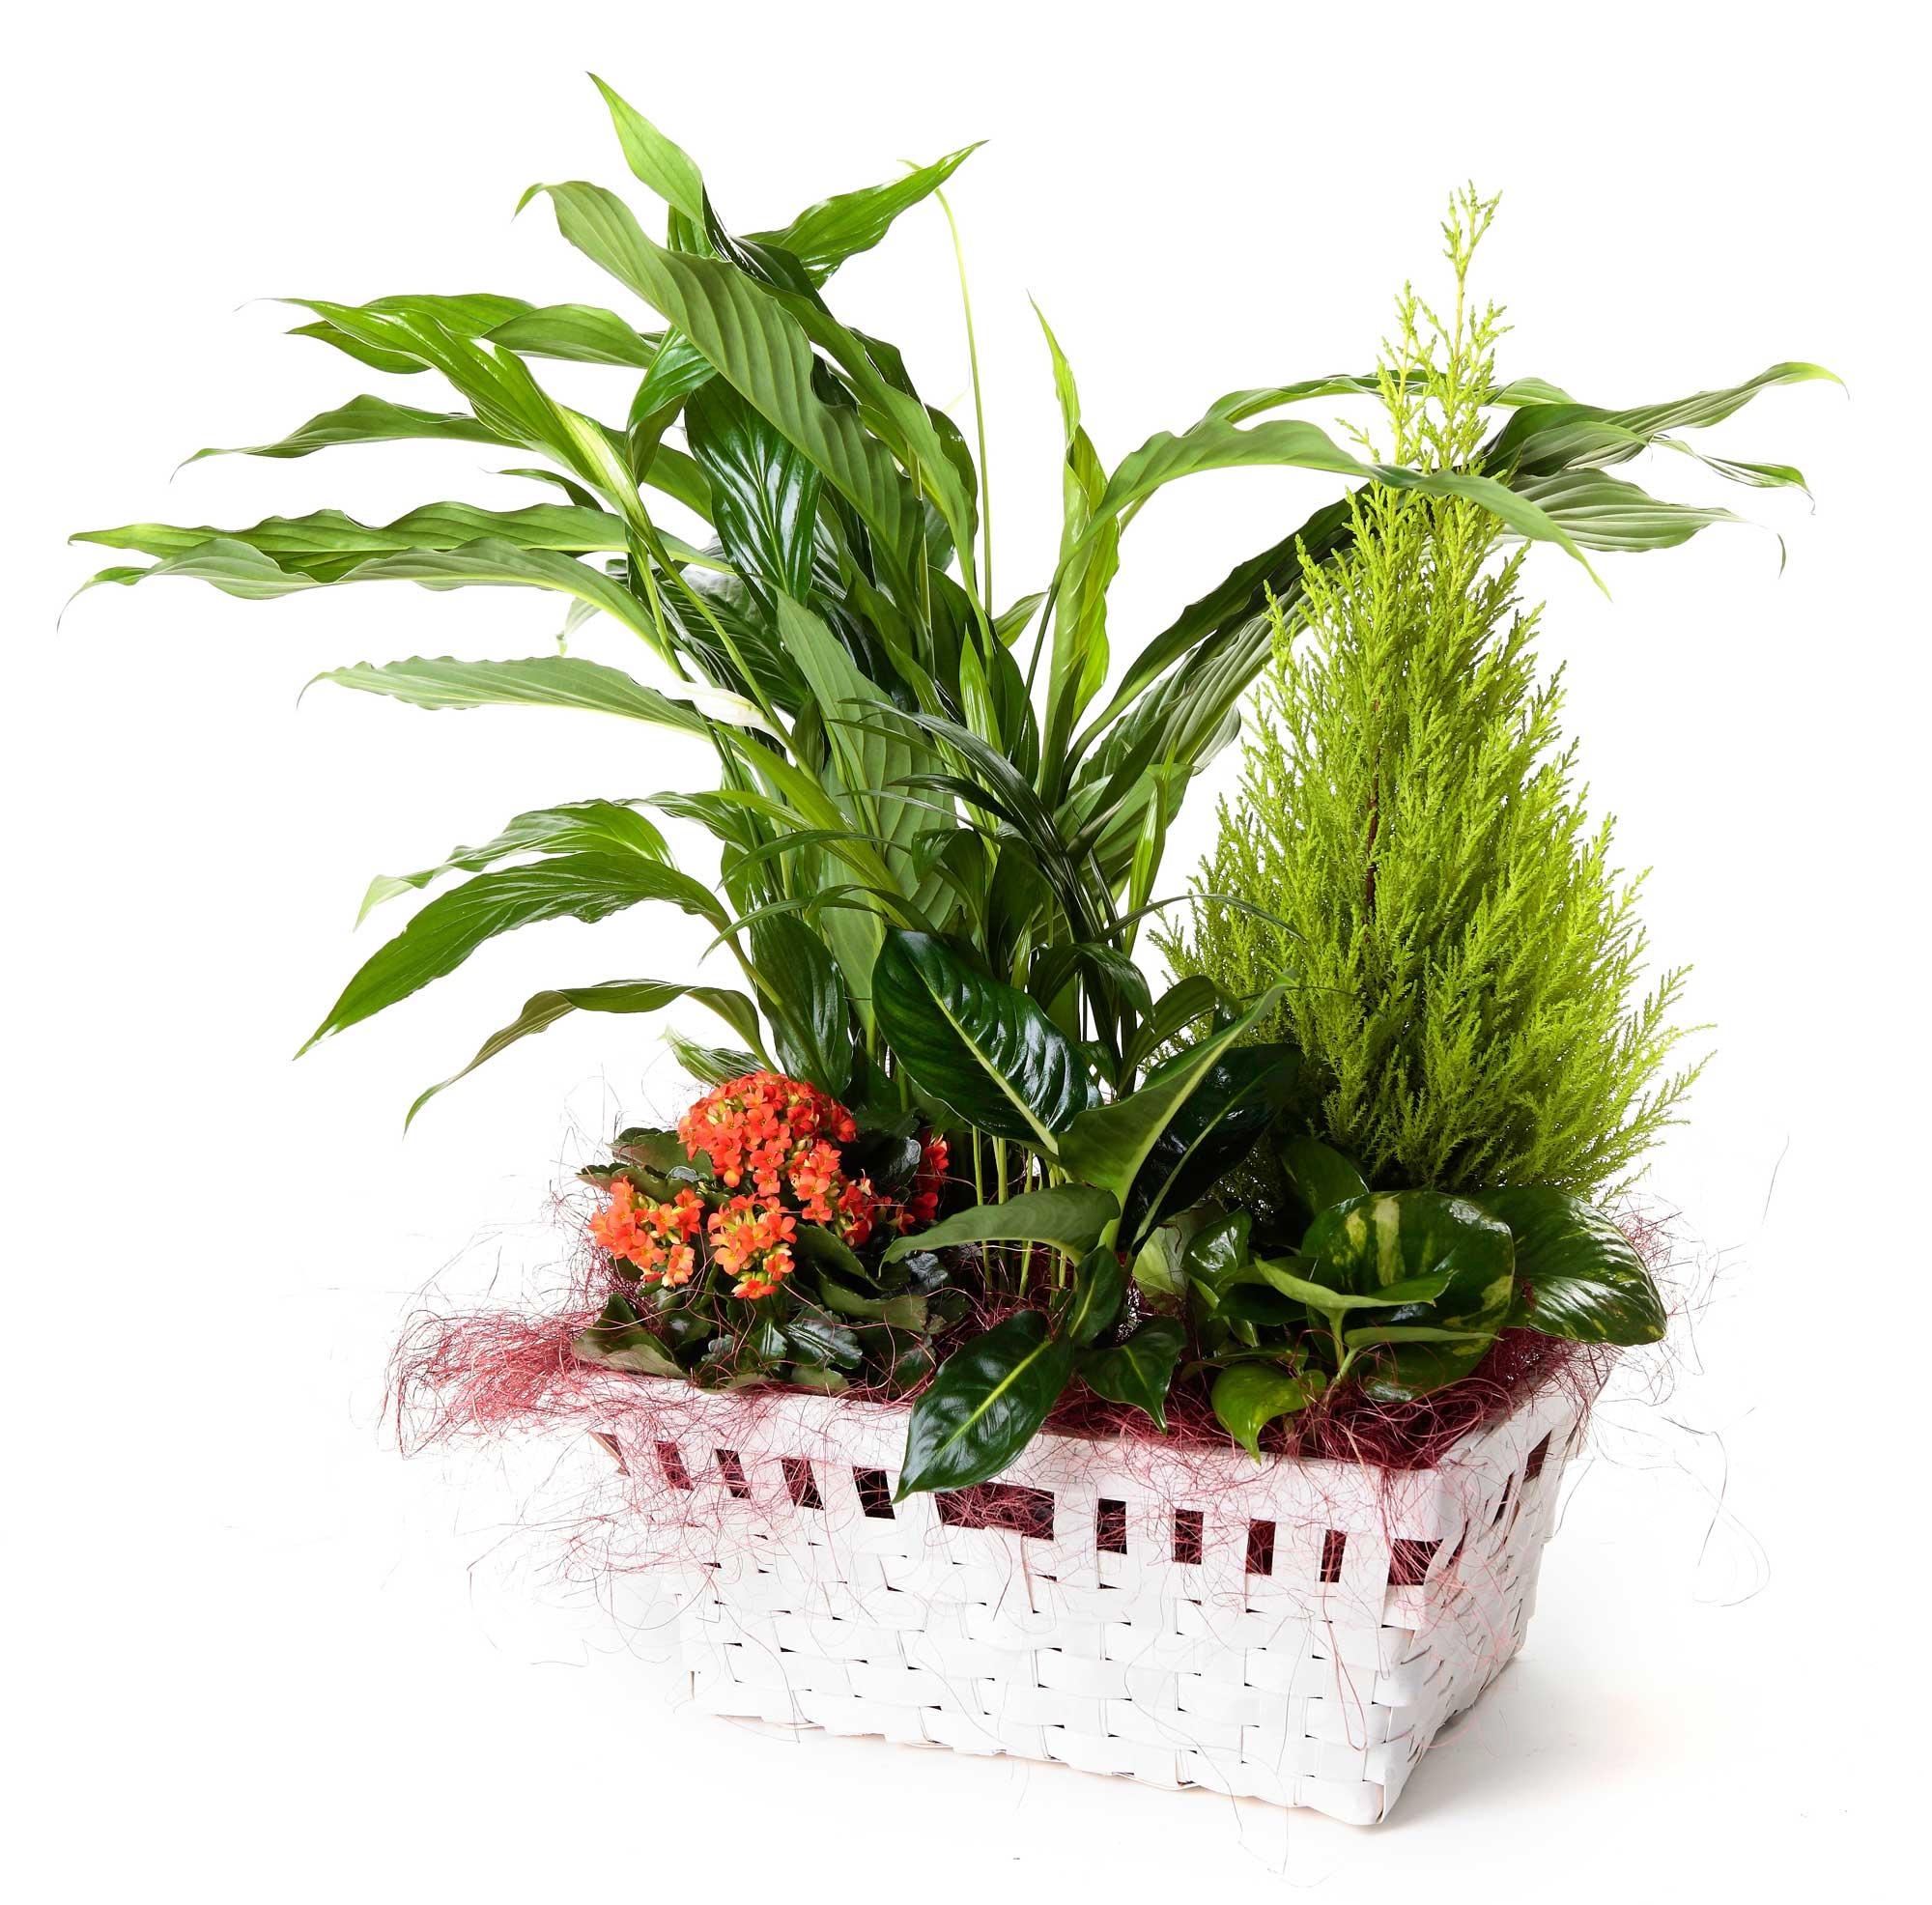 Cesta de plantas con spatifilium regalo cestas de plantas plantas en le n flor flora - Plantas pequenas para regalar boda ...